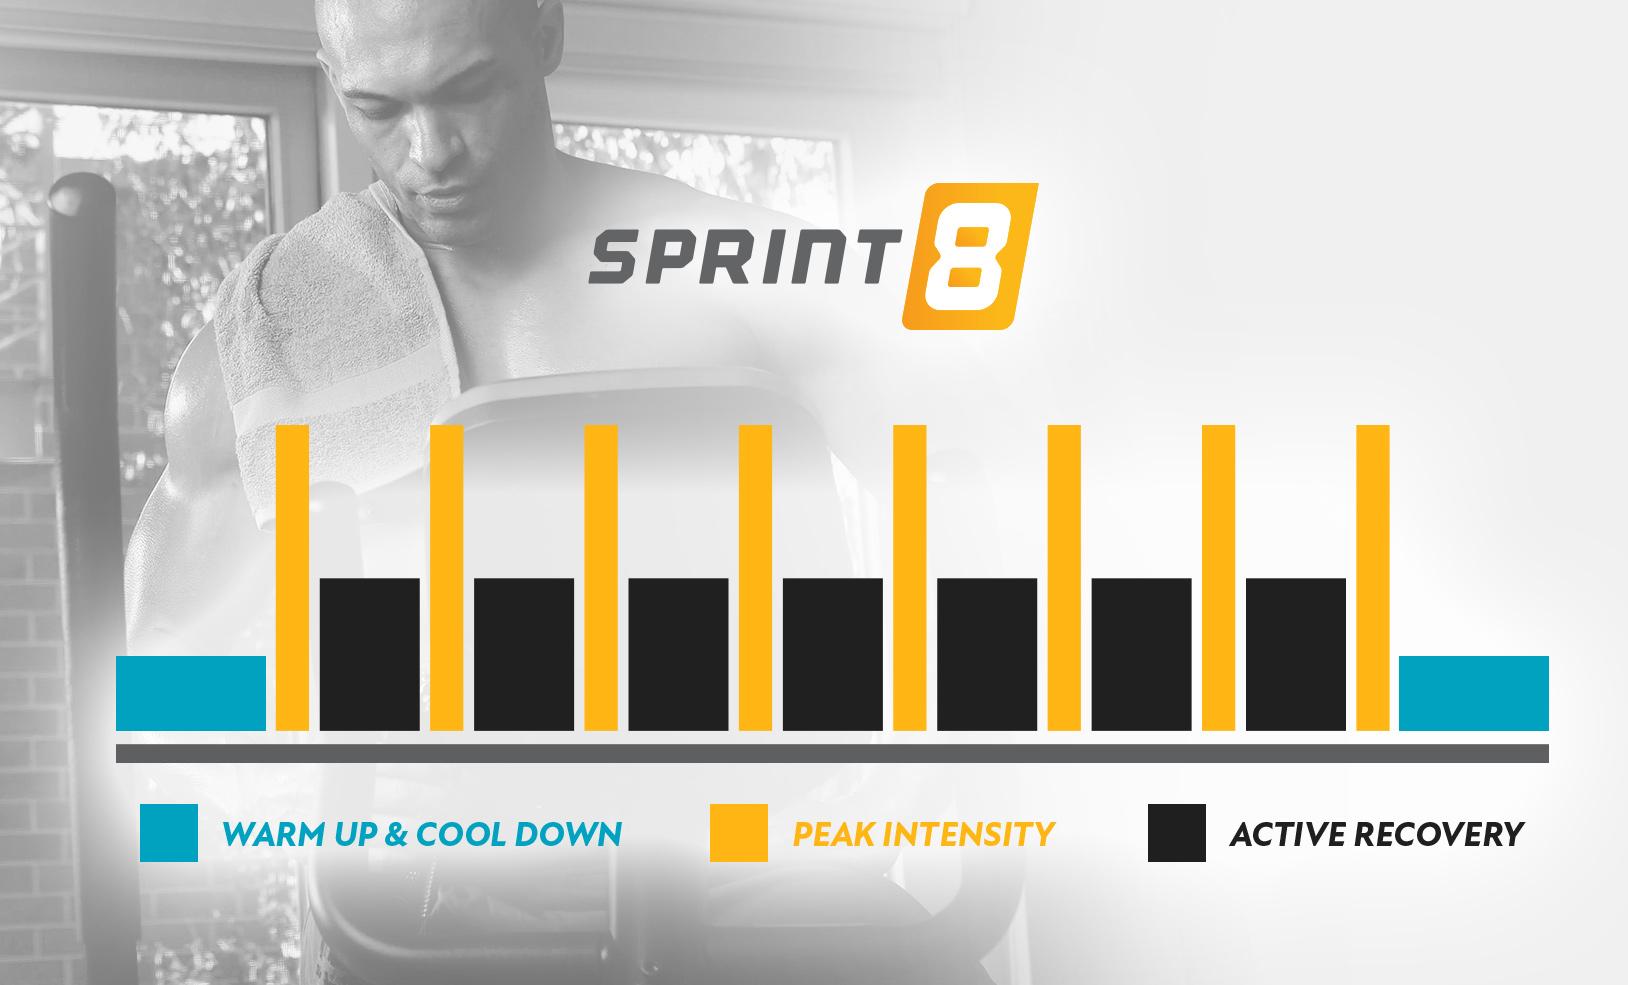 Sprint 8 HIIT Programming